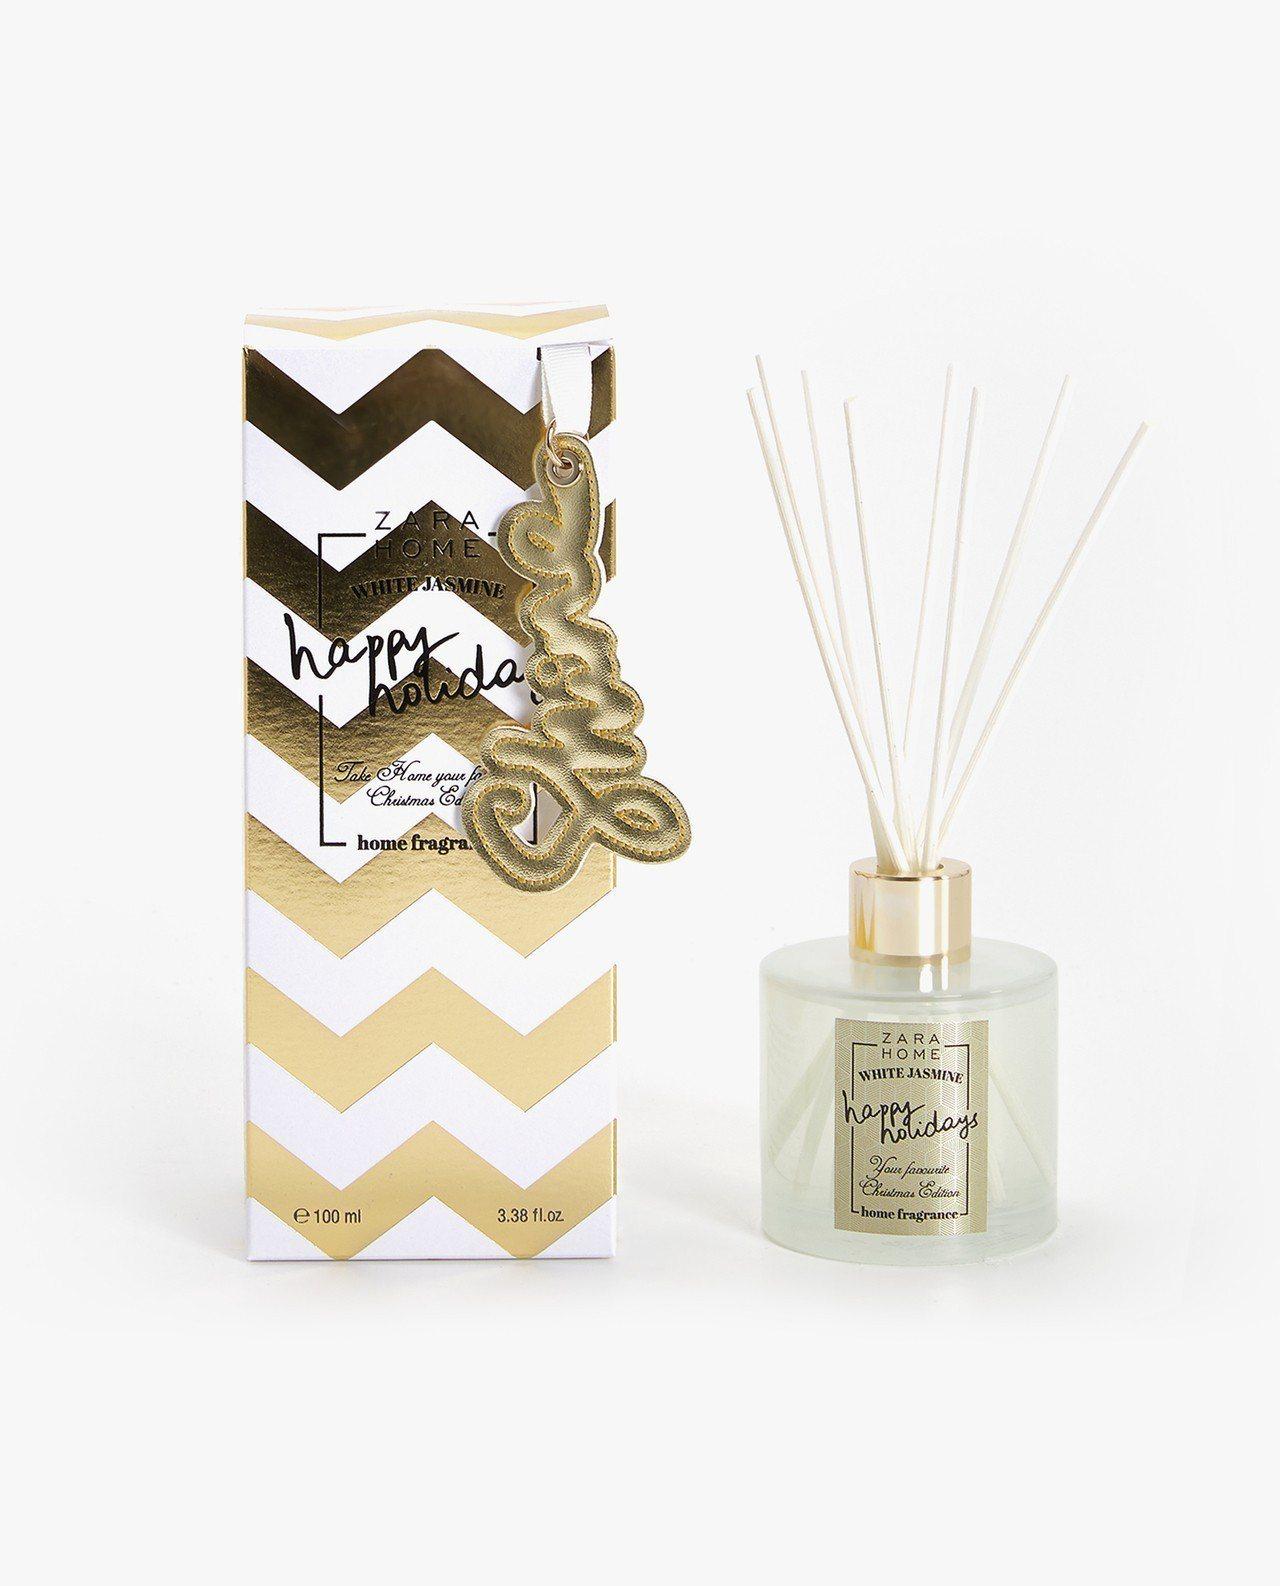 ZARA HOME耶誕香氣的金+雪白款是暢銷香氣White Jasmine白色茉...